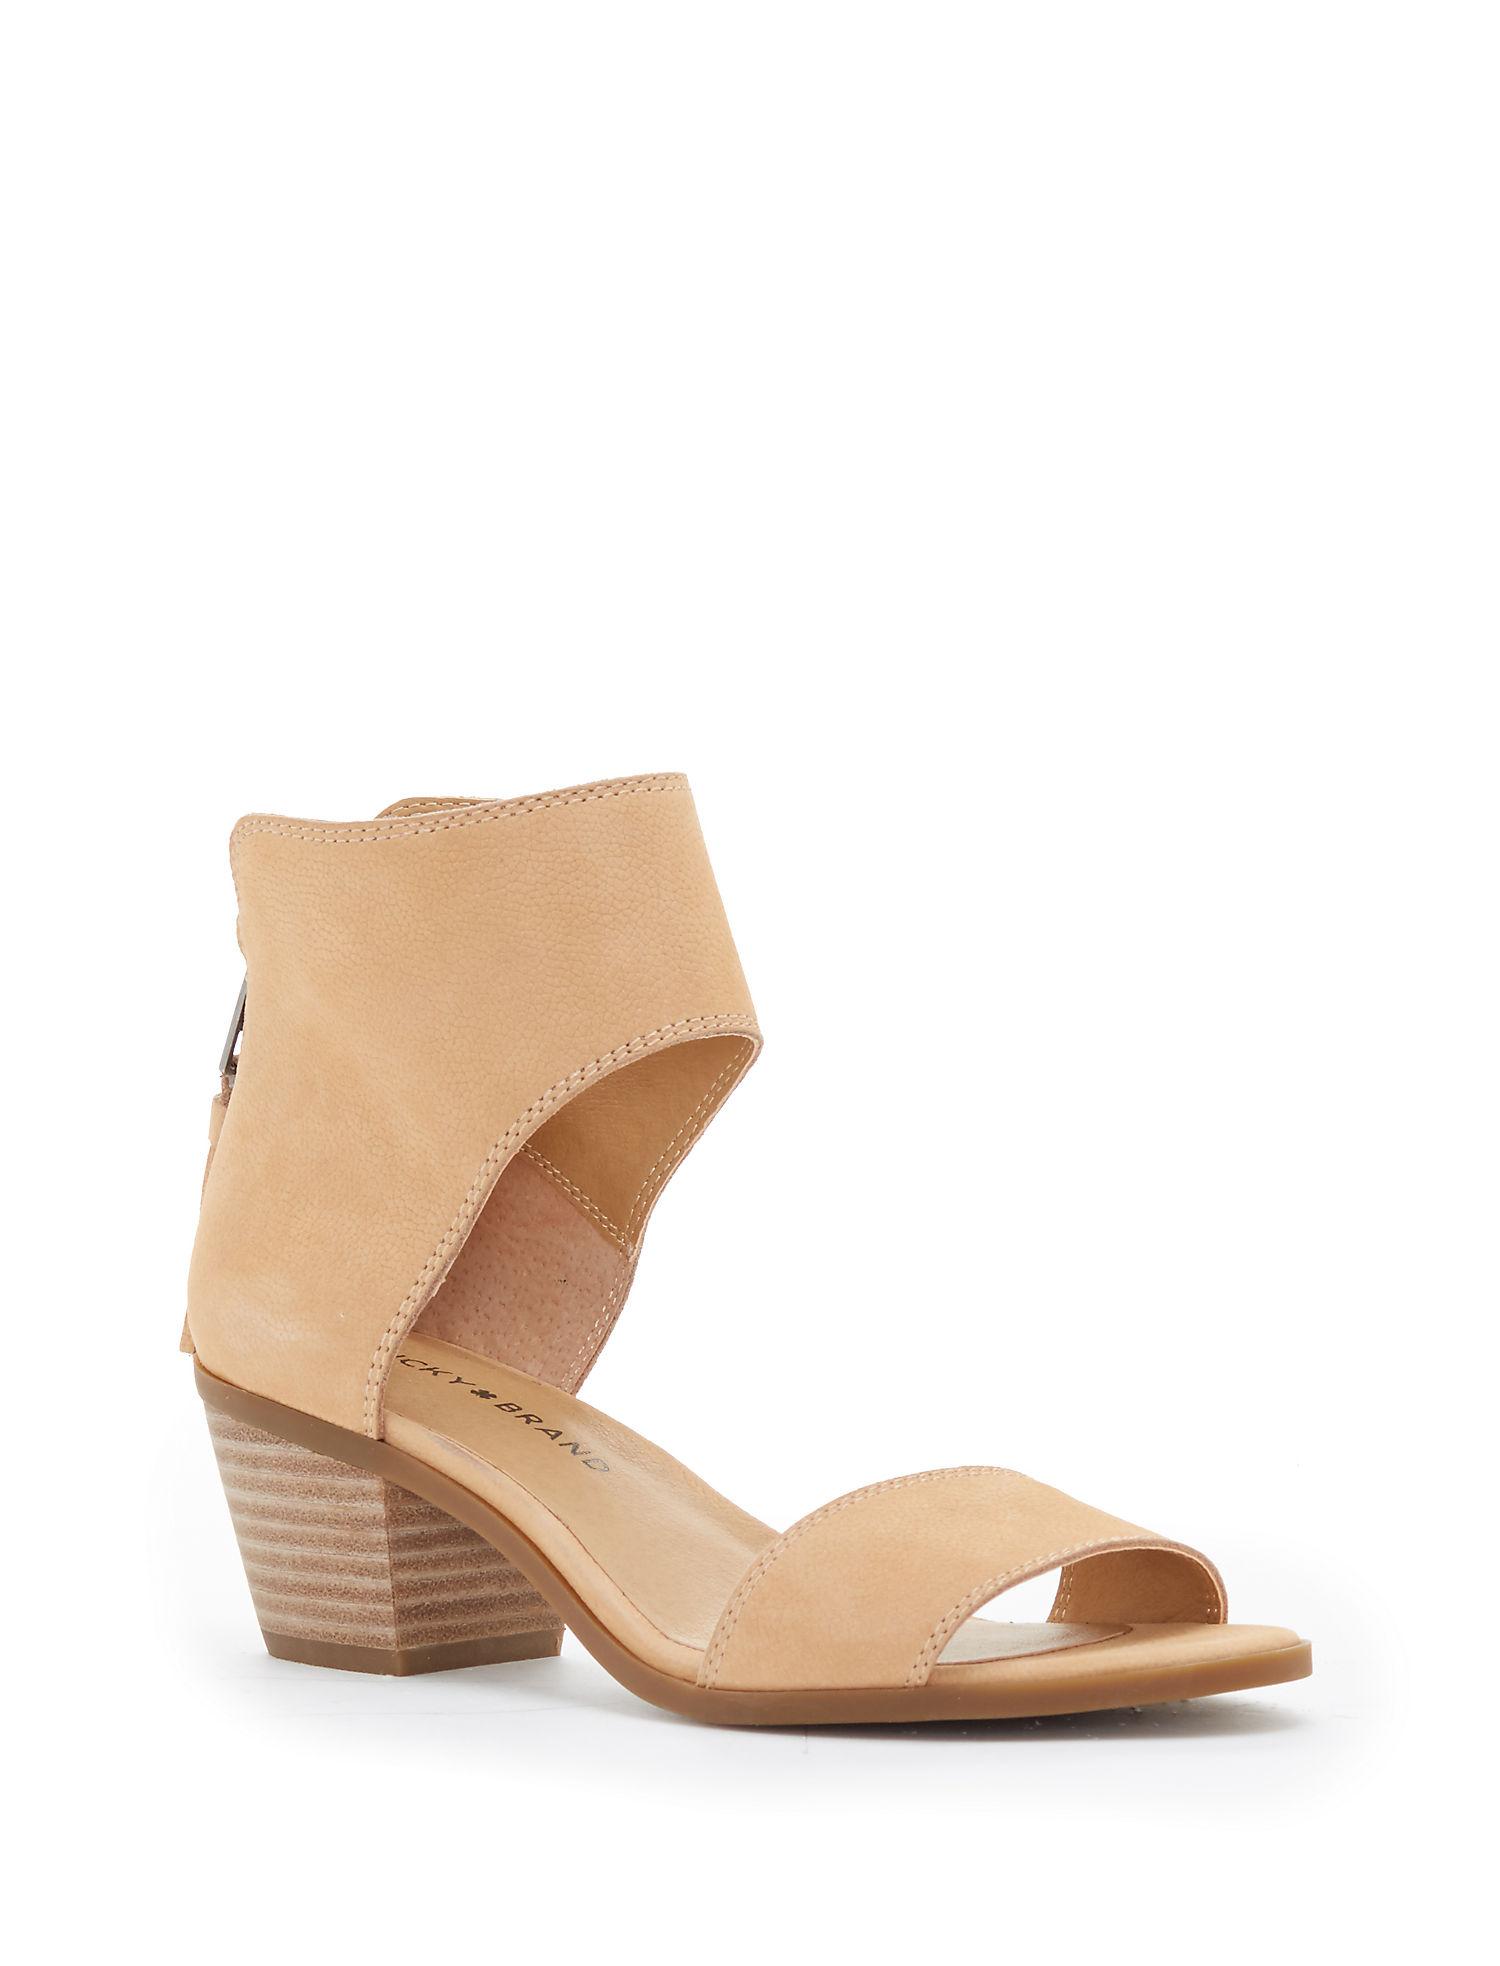 Black earth sandals - Lucky Barbina Heel